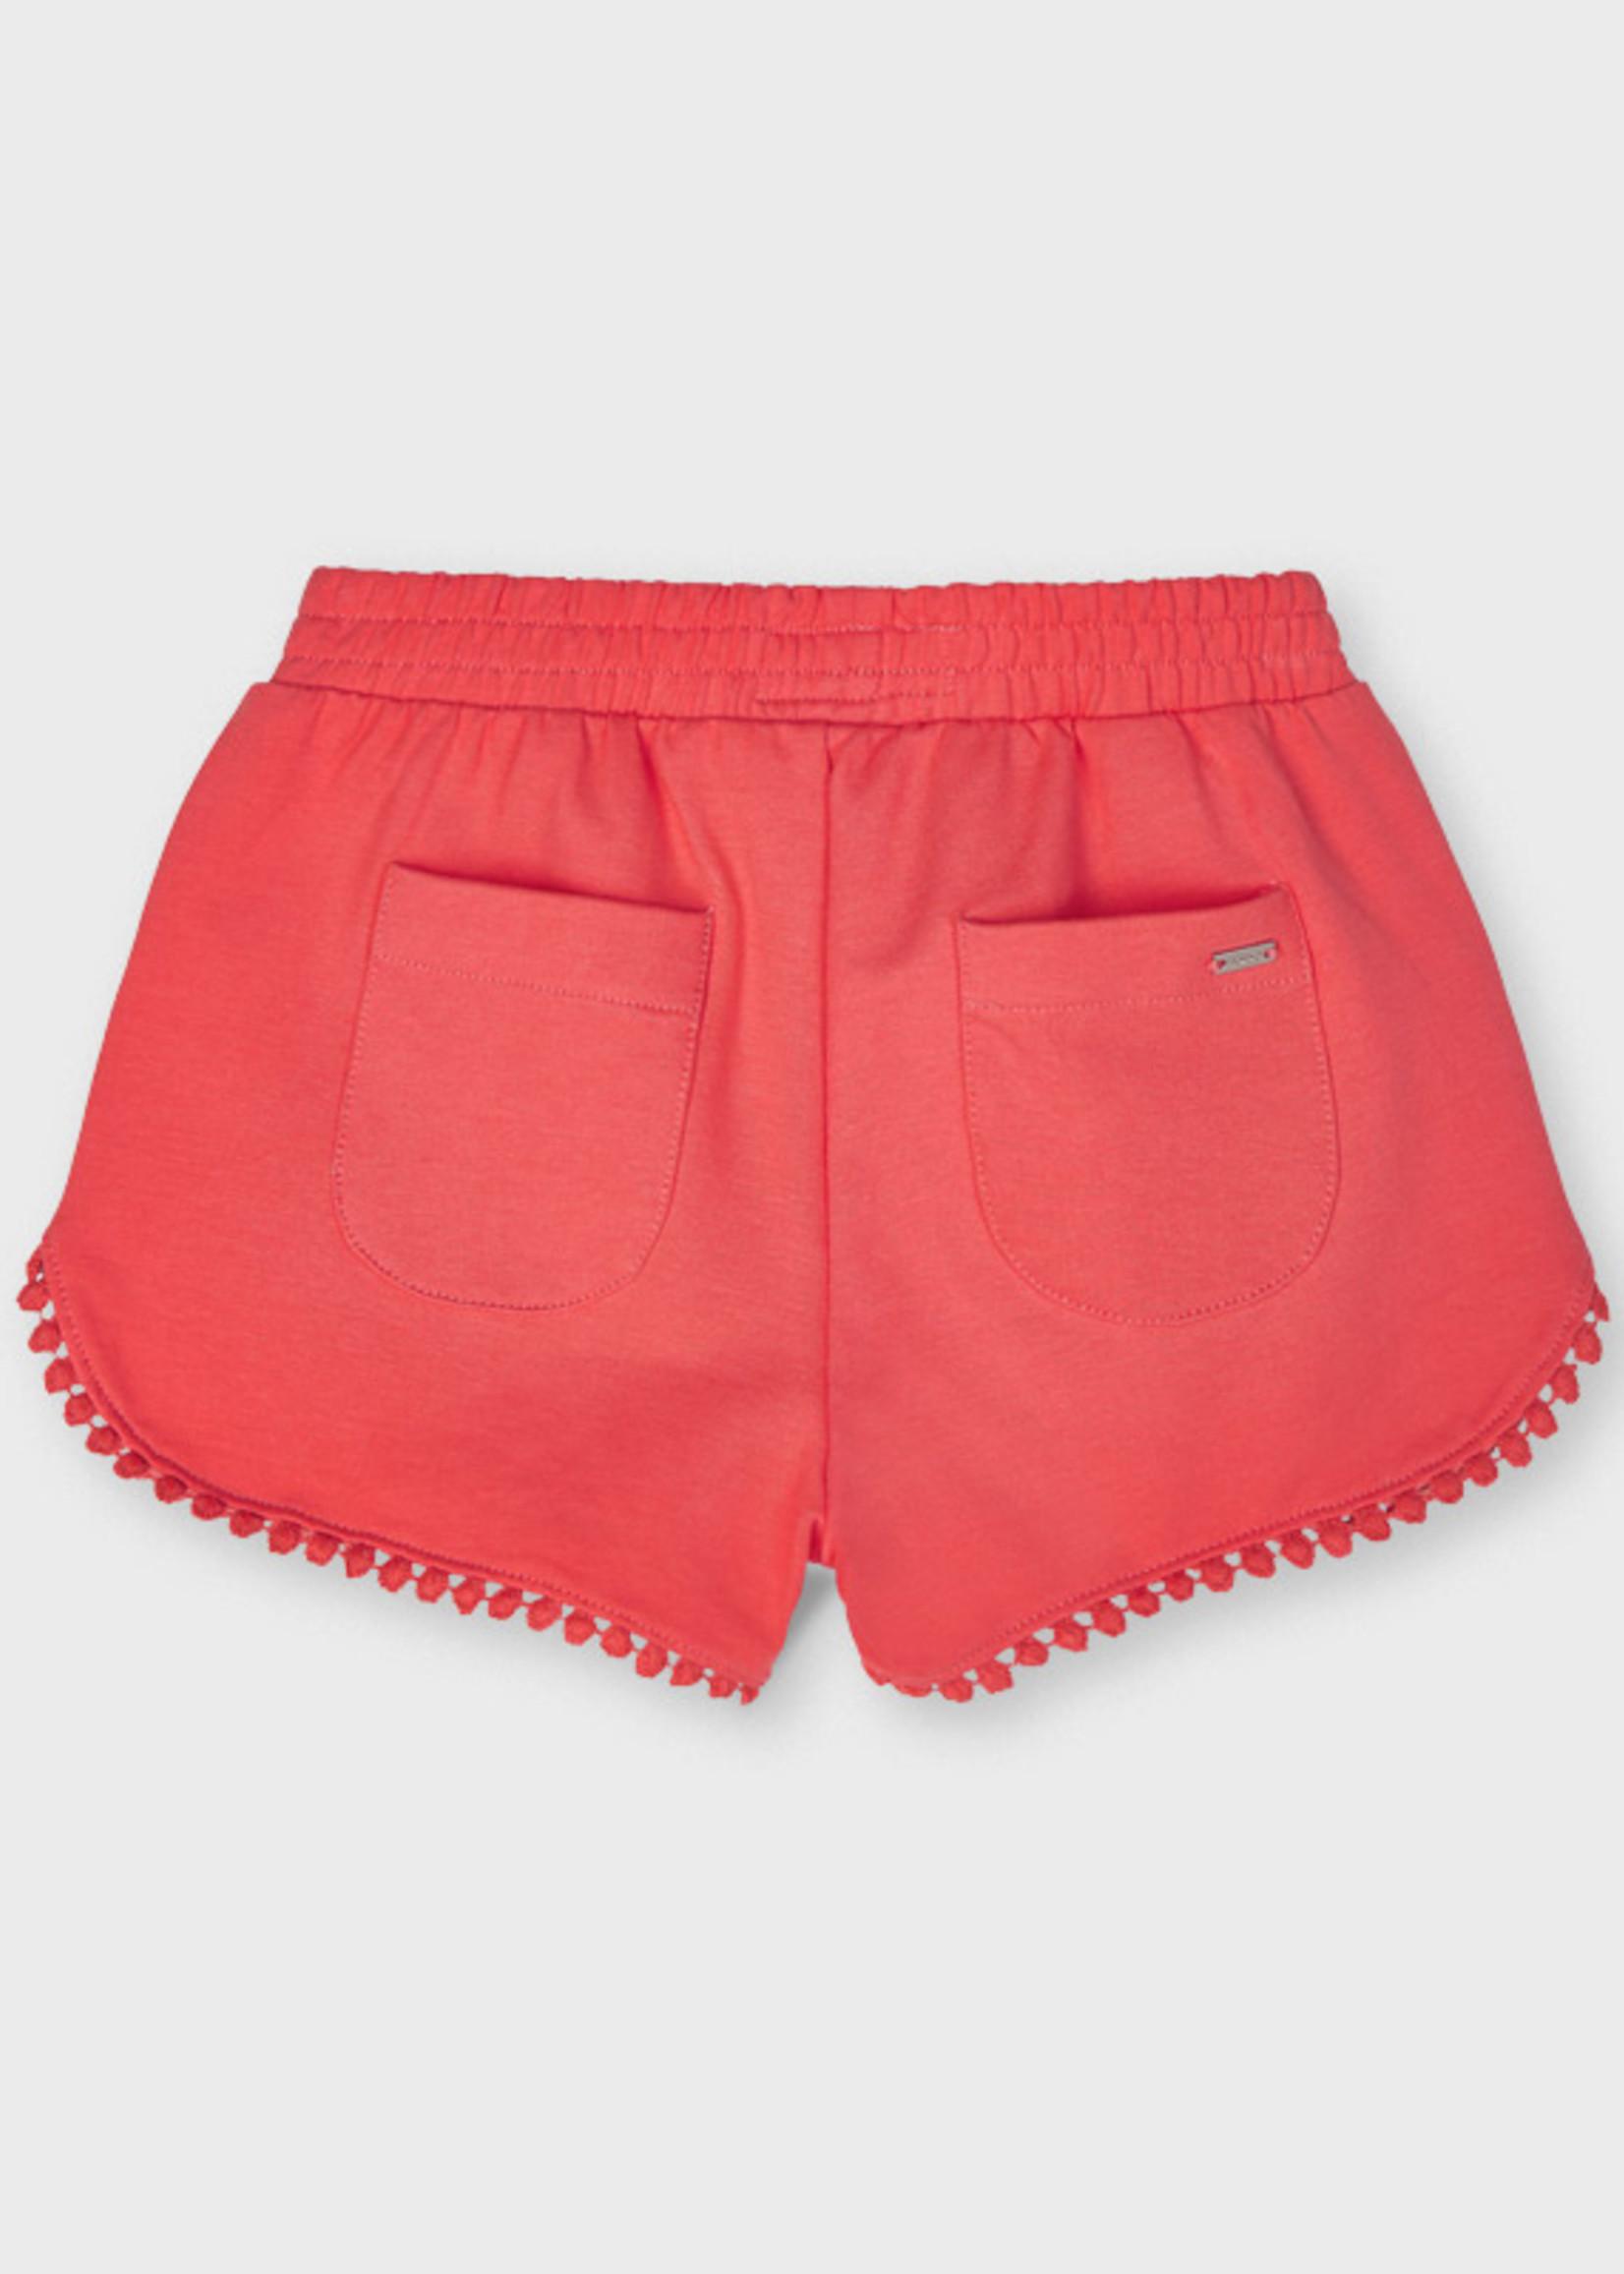 Mayoral Mayoral Chenille shorts